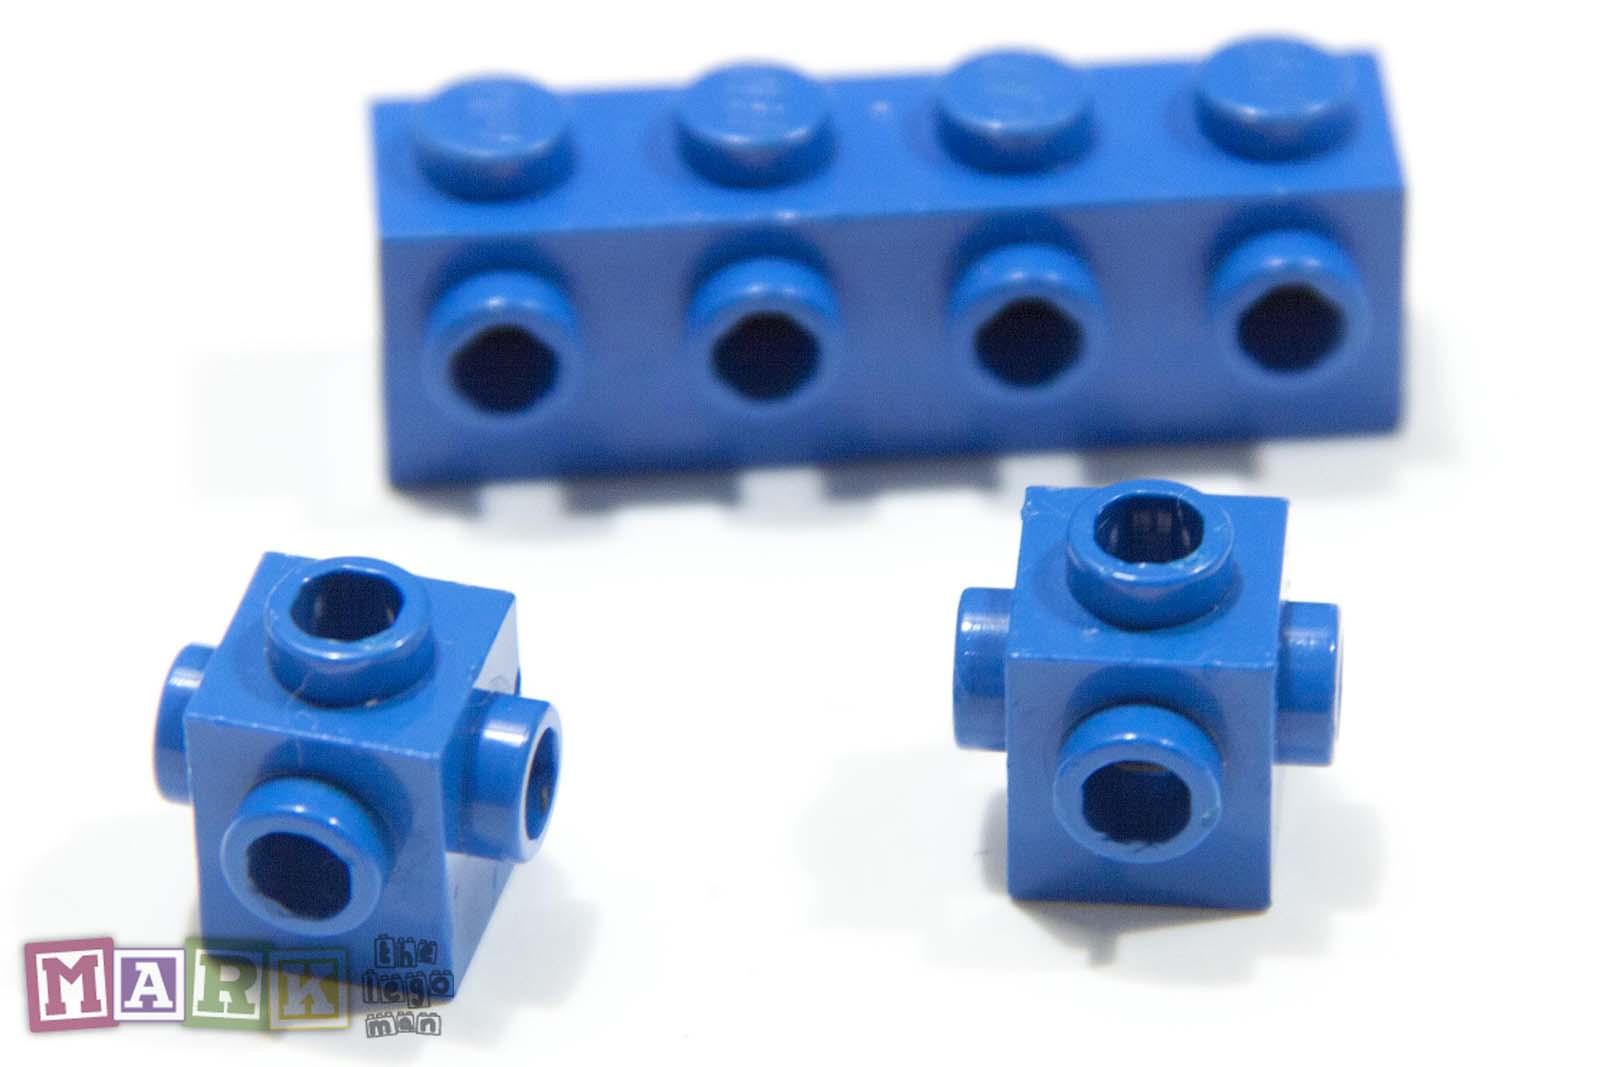 Rare Lego Blue Stud Bricks Job Lot 4733 30414 | Mad About ...